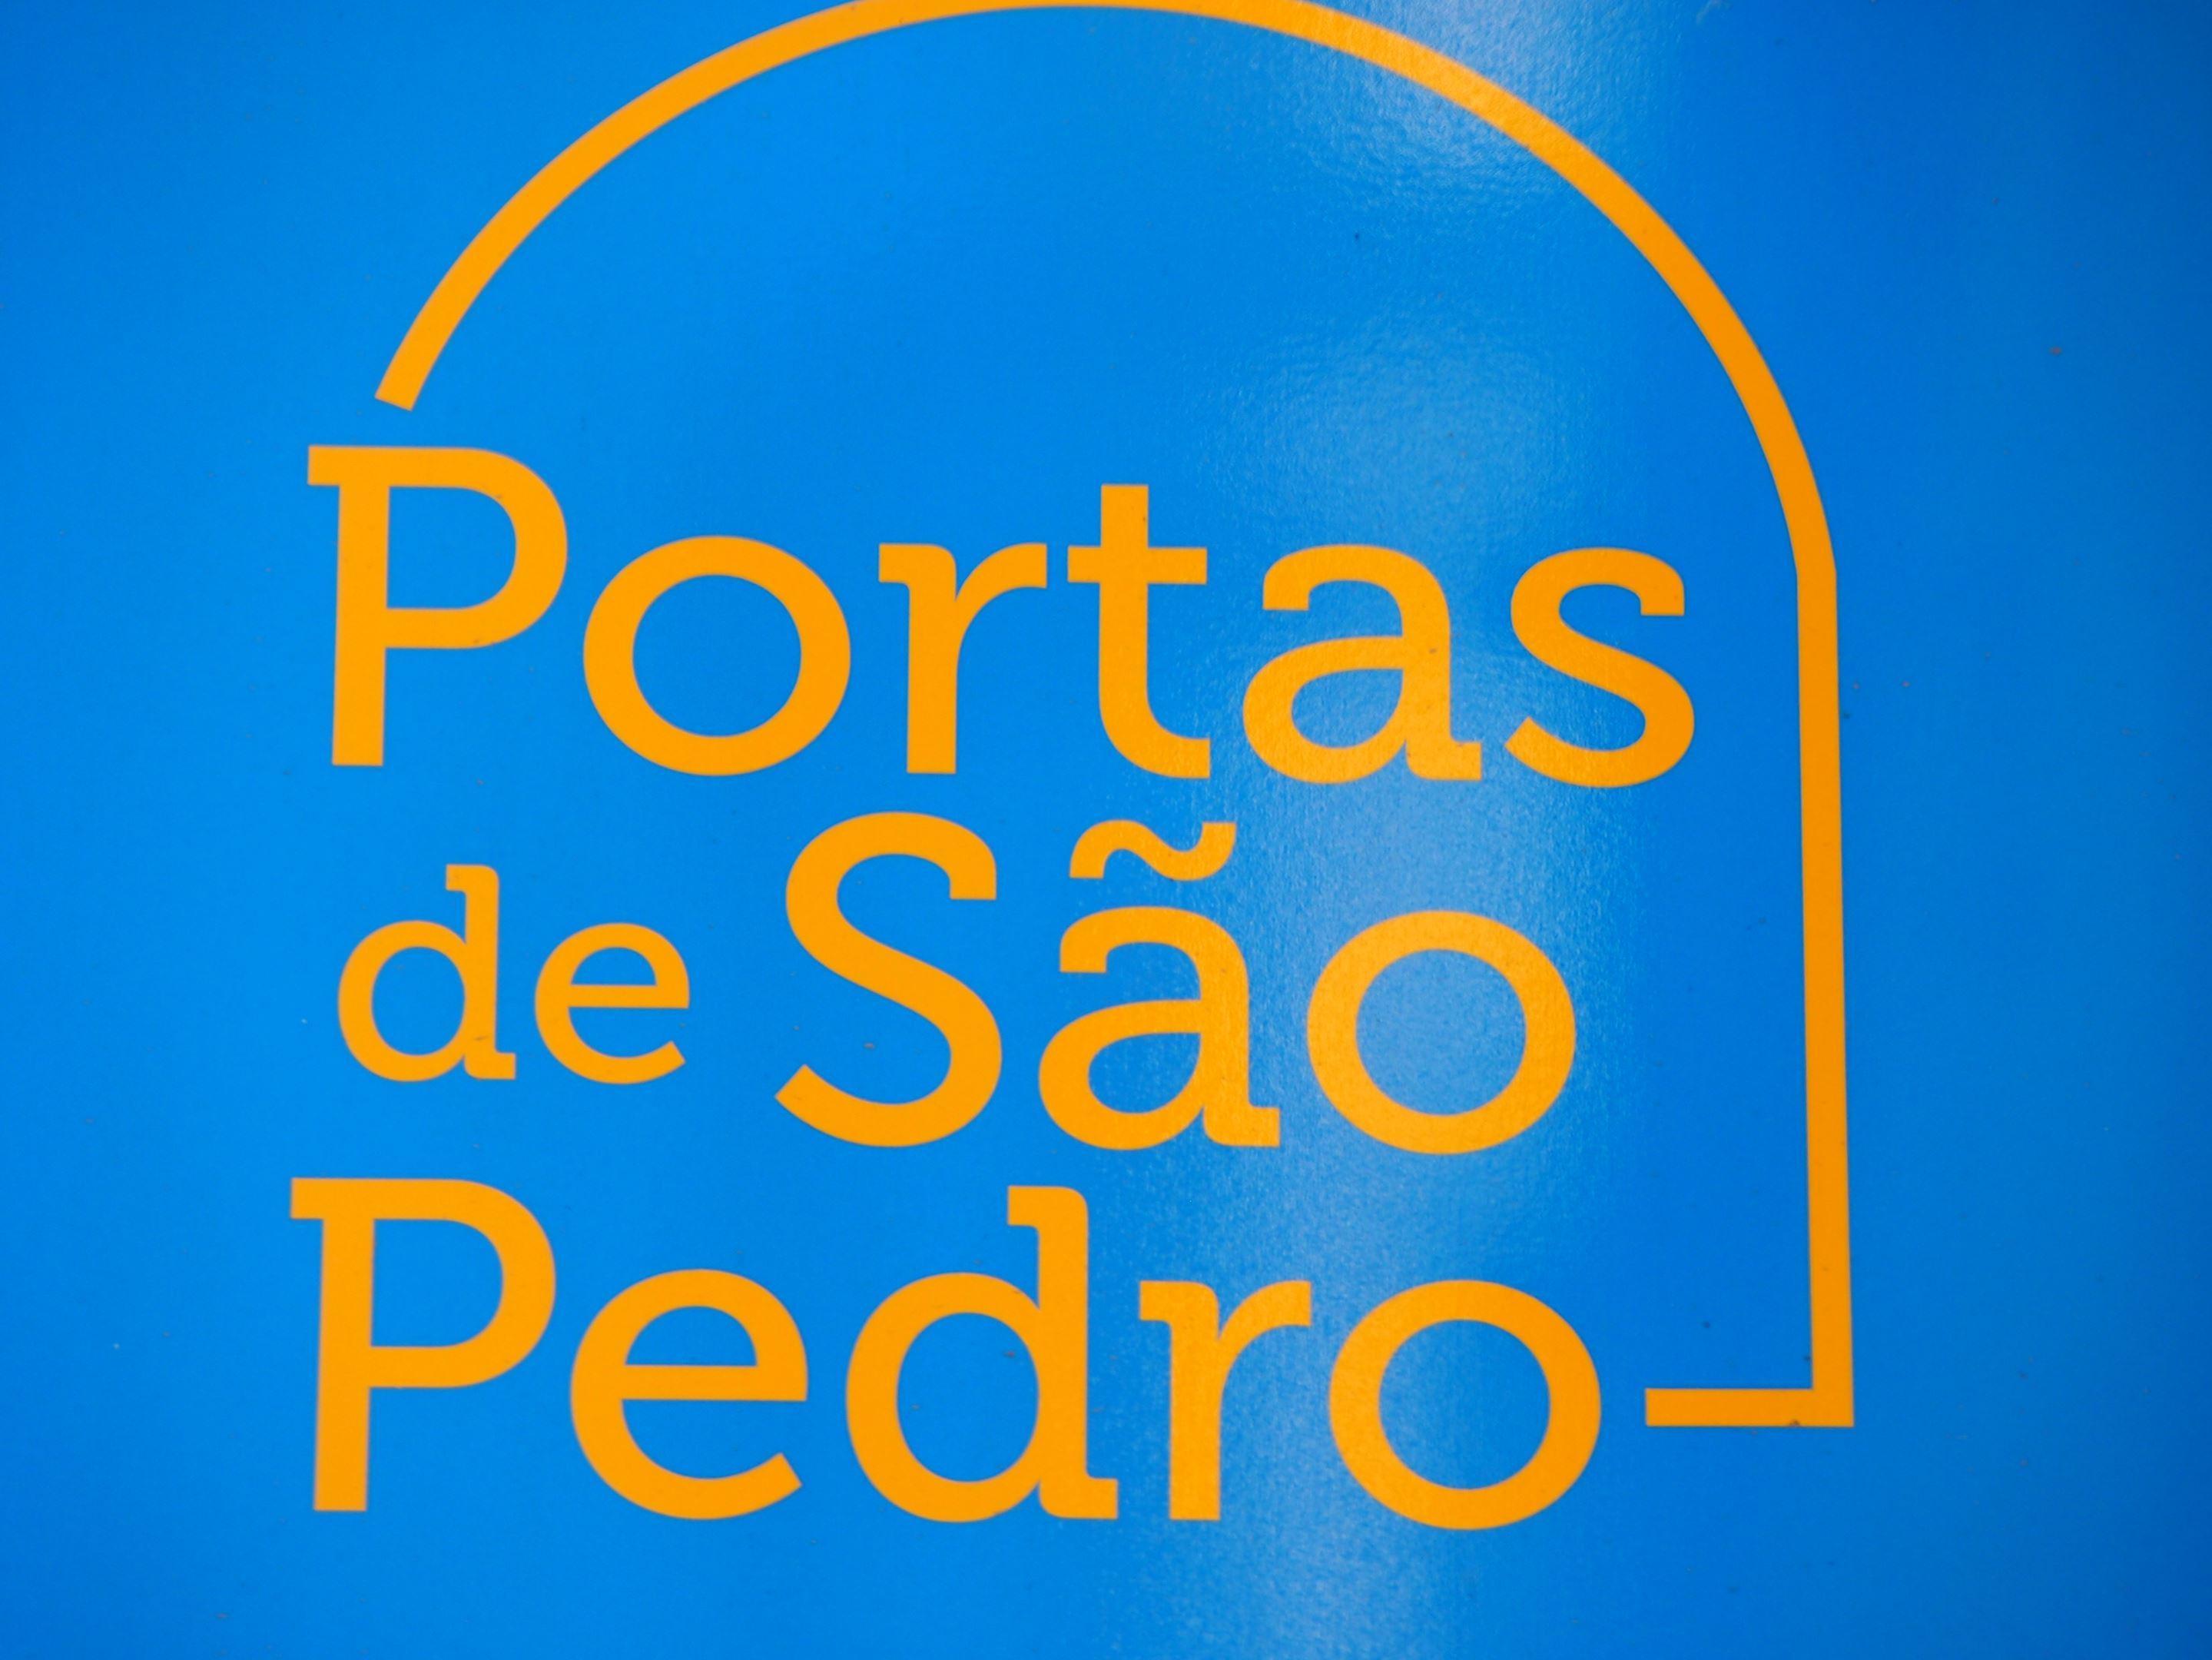 Portas de São Pedro restaurant, Faro